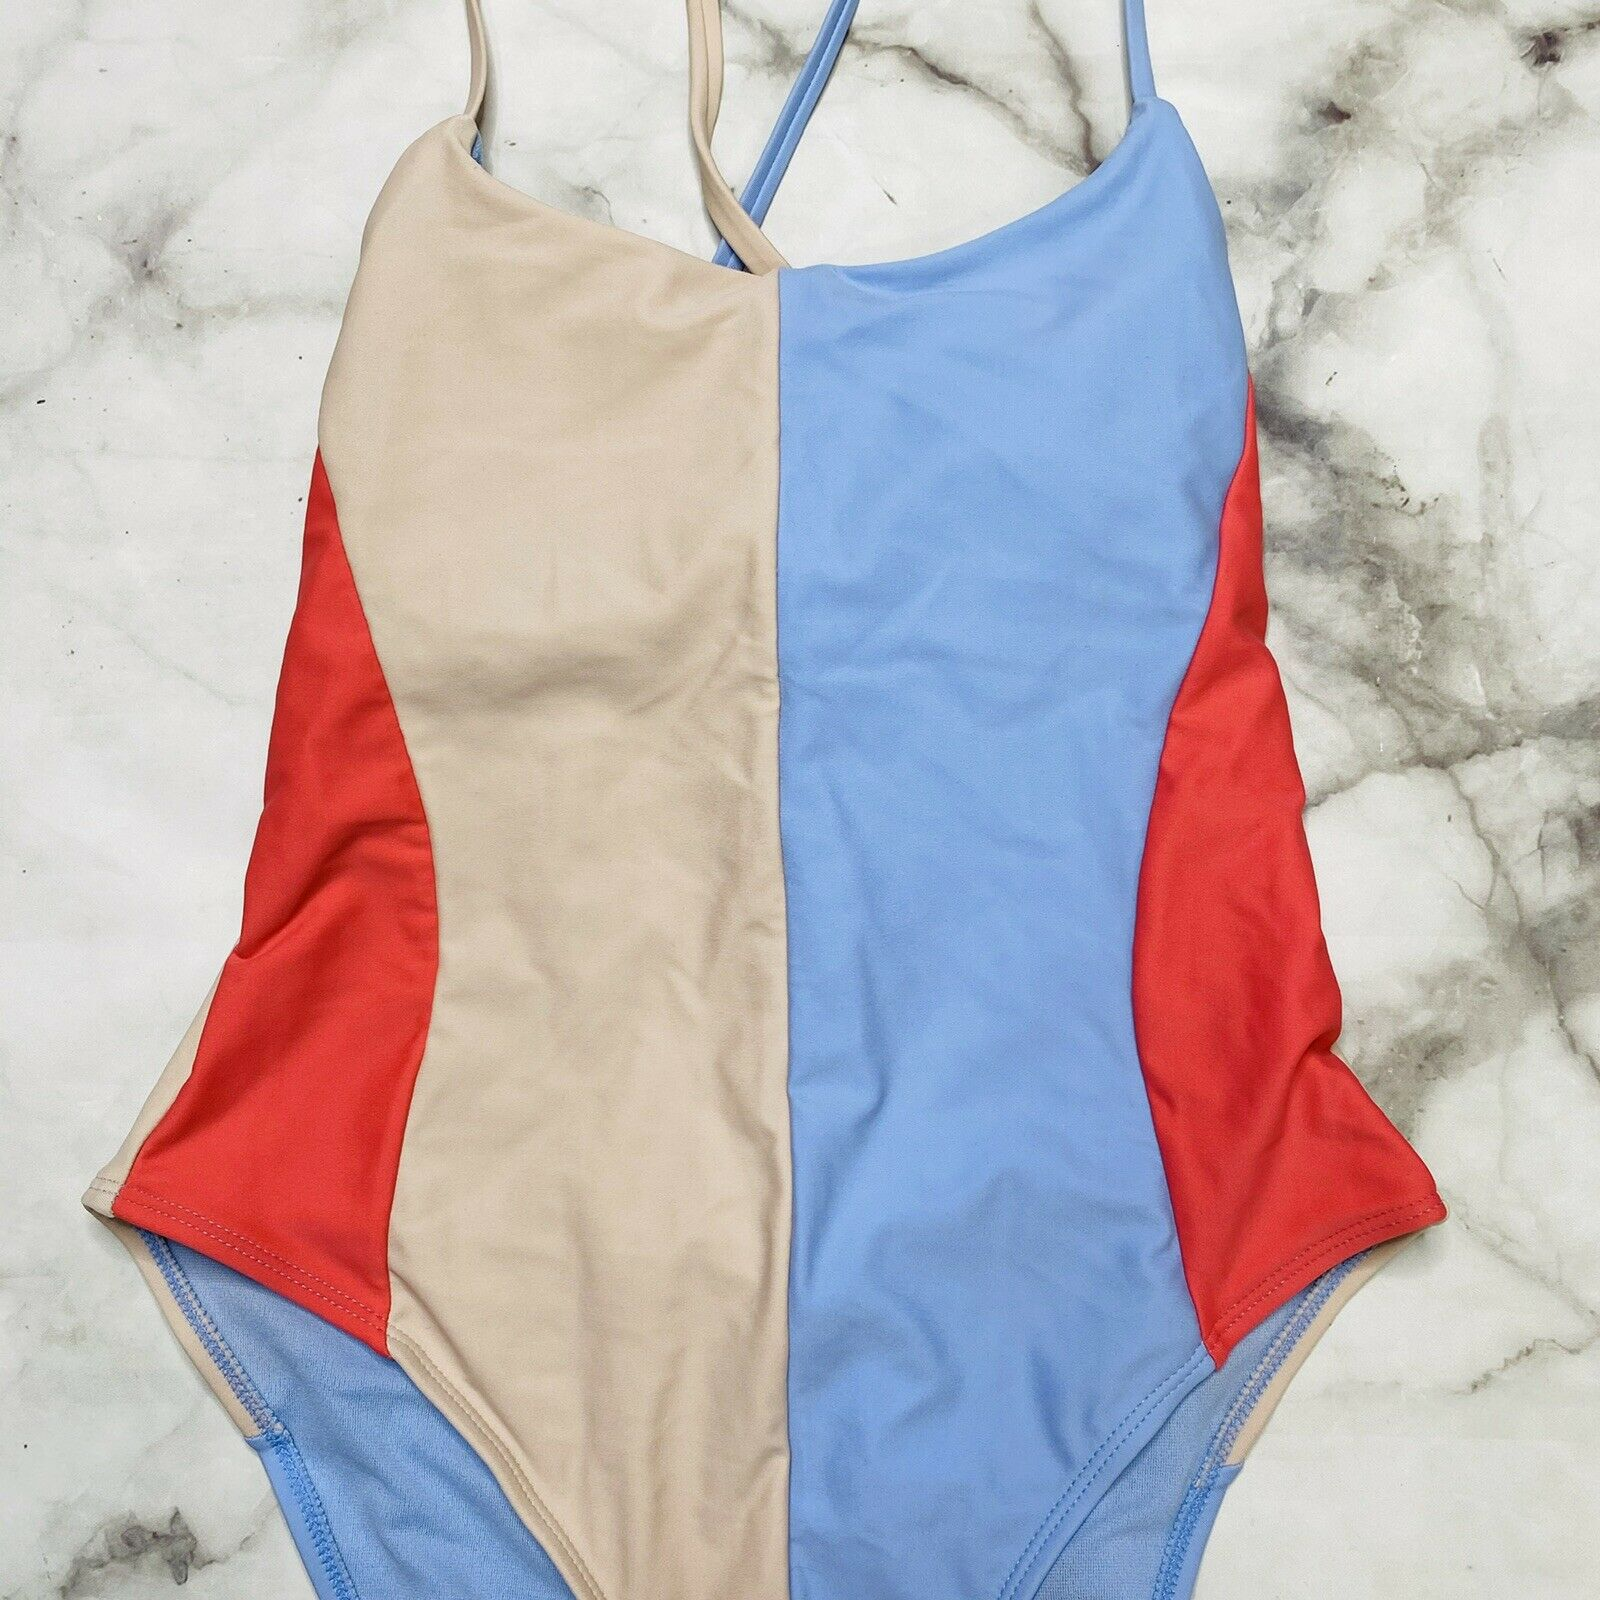 Hula Honey Colorblocked High-Leg Strappy Back One-Piece Multi Swimsuit Pick Size